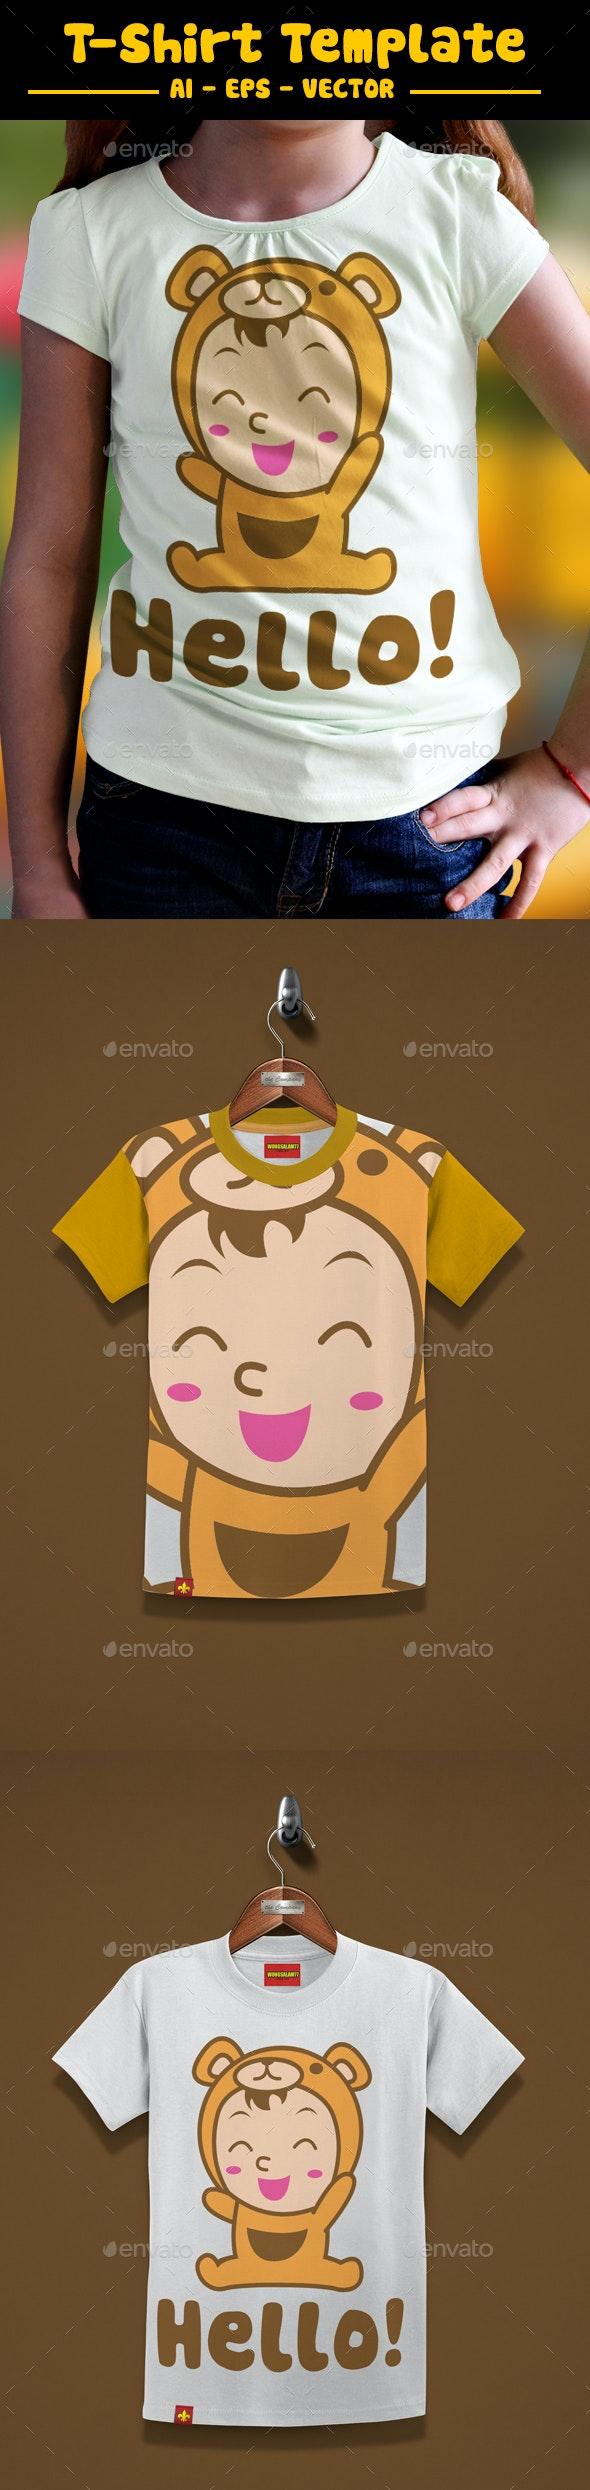 Kids T-Shirt Design - Funny Designs